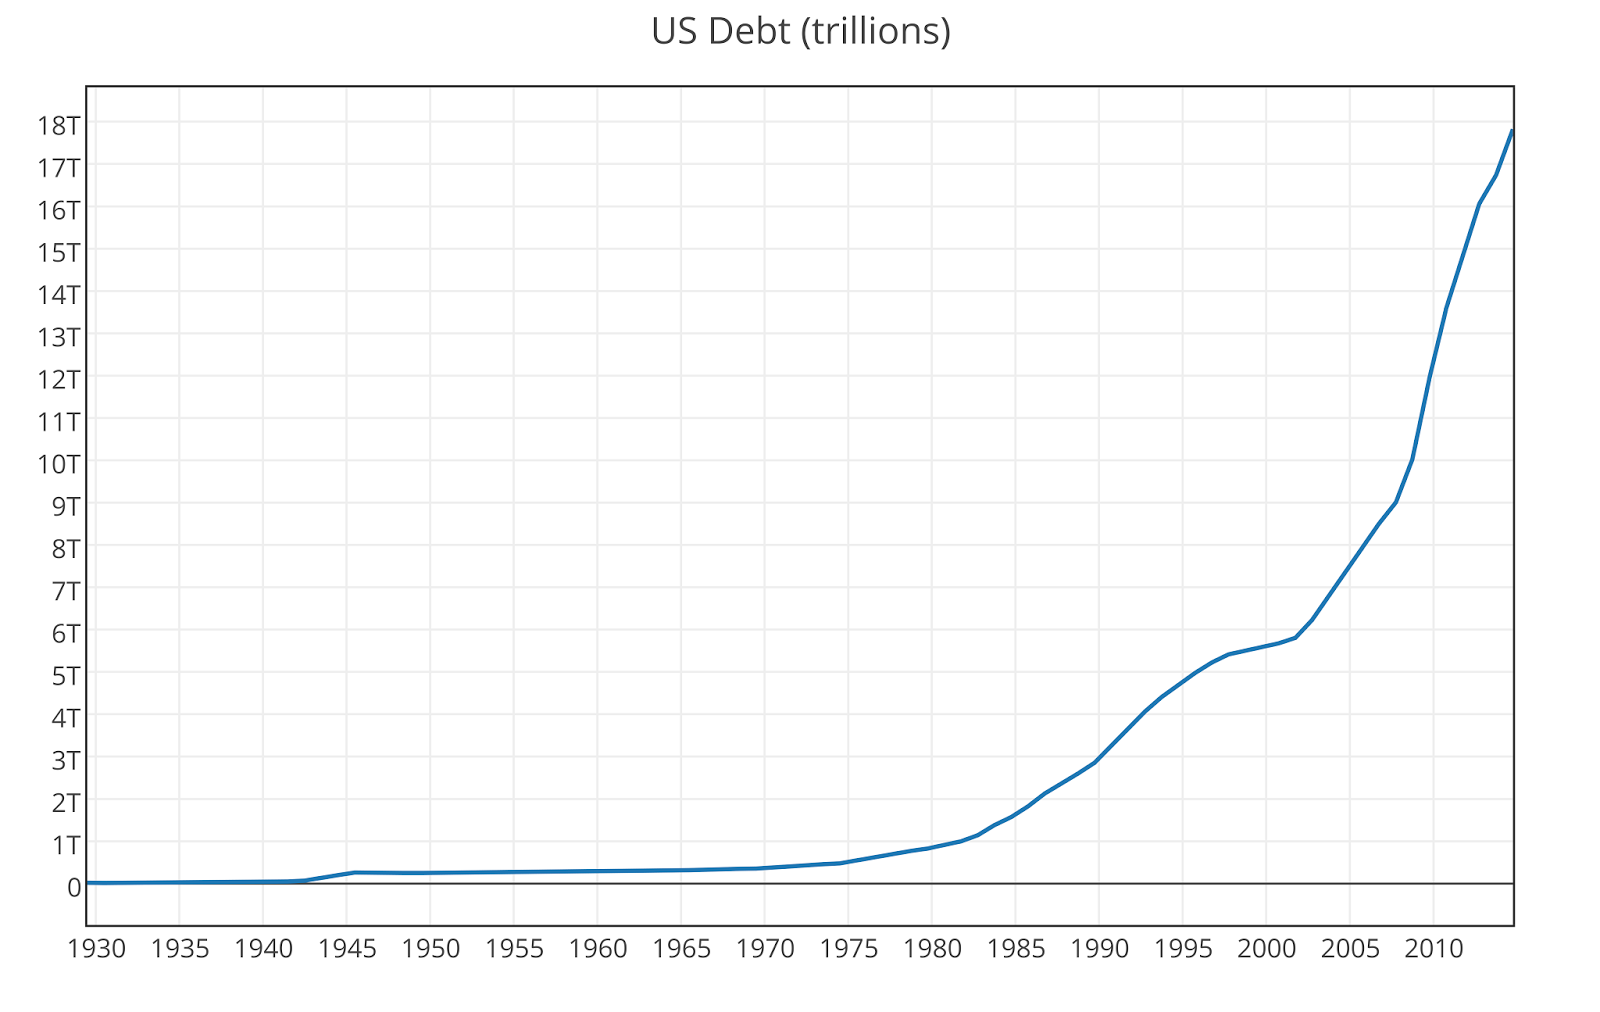 Myth of the Debt - United States GDP vs United States Debt